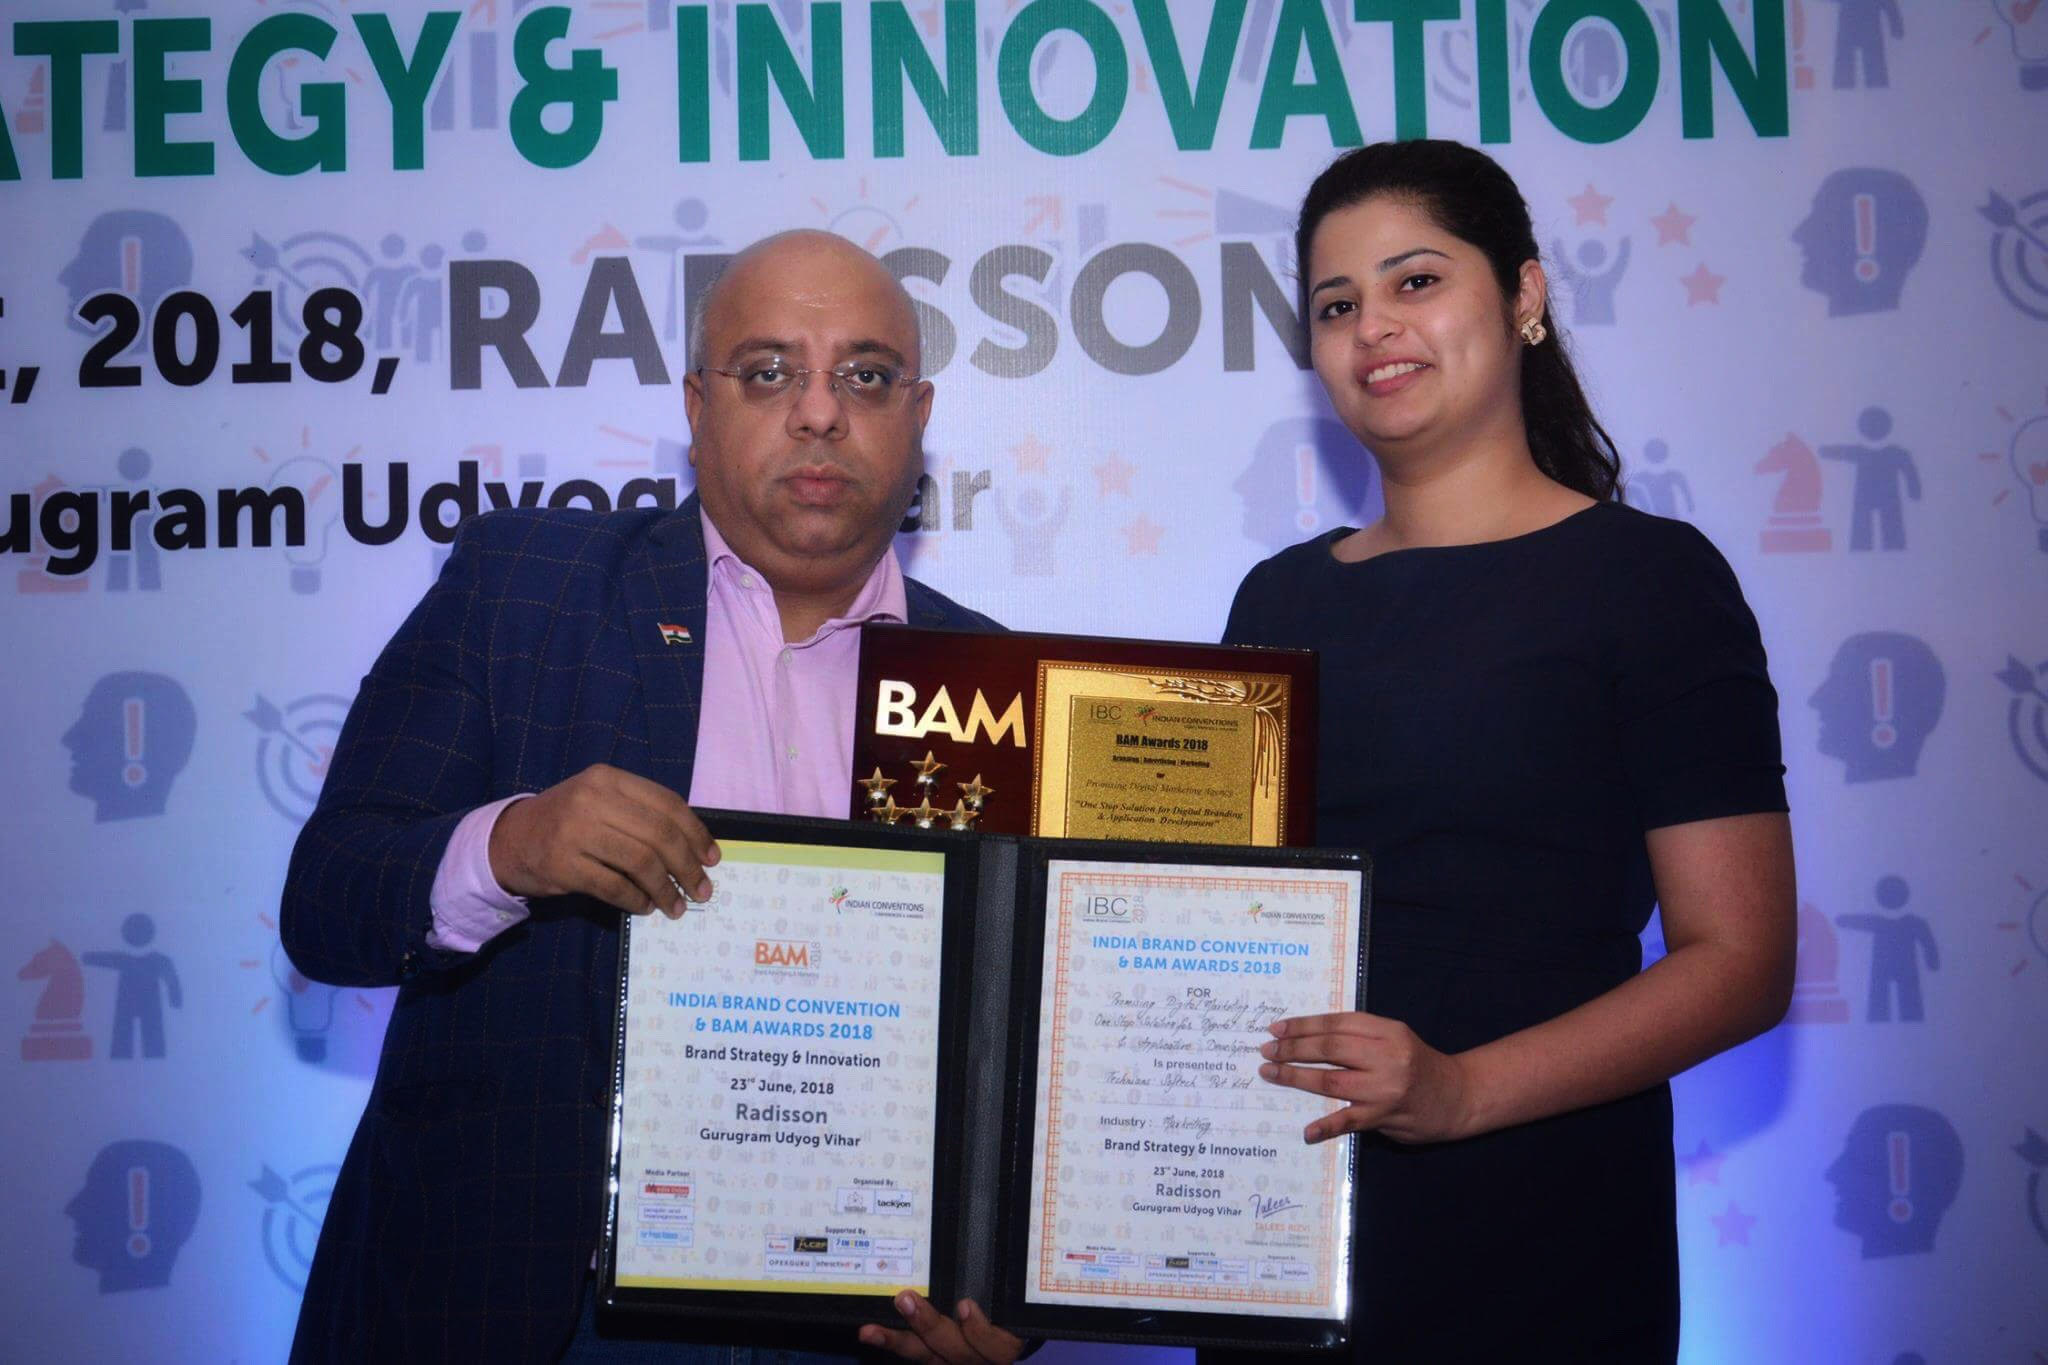 BAM Awards 2018